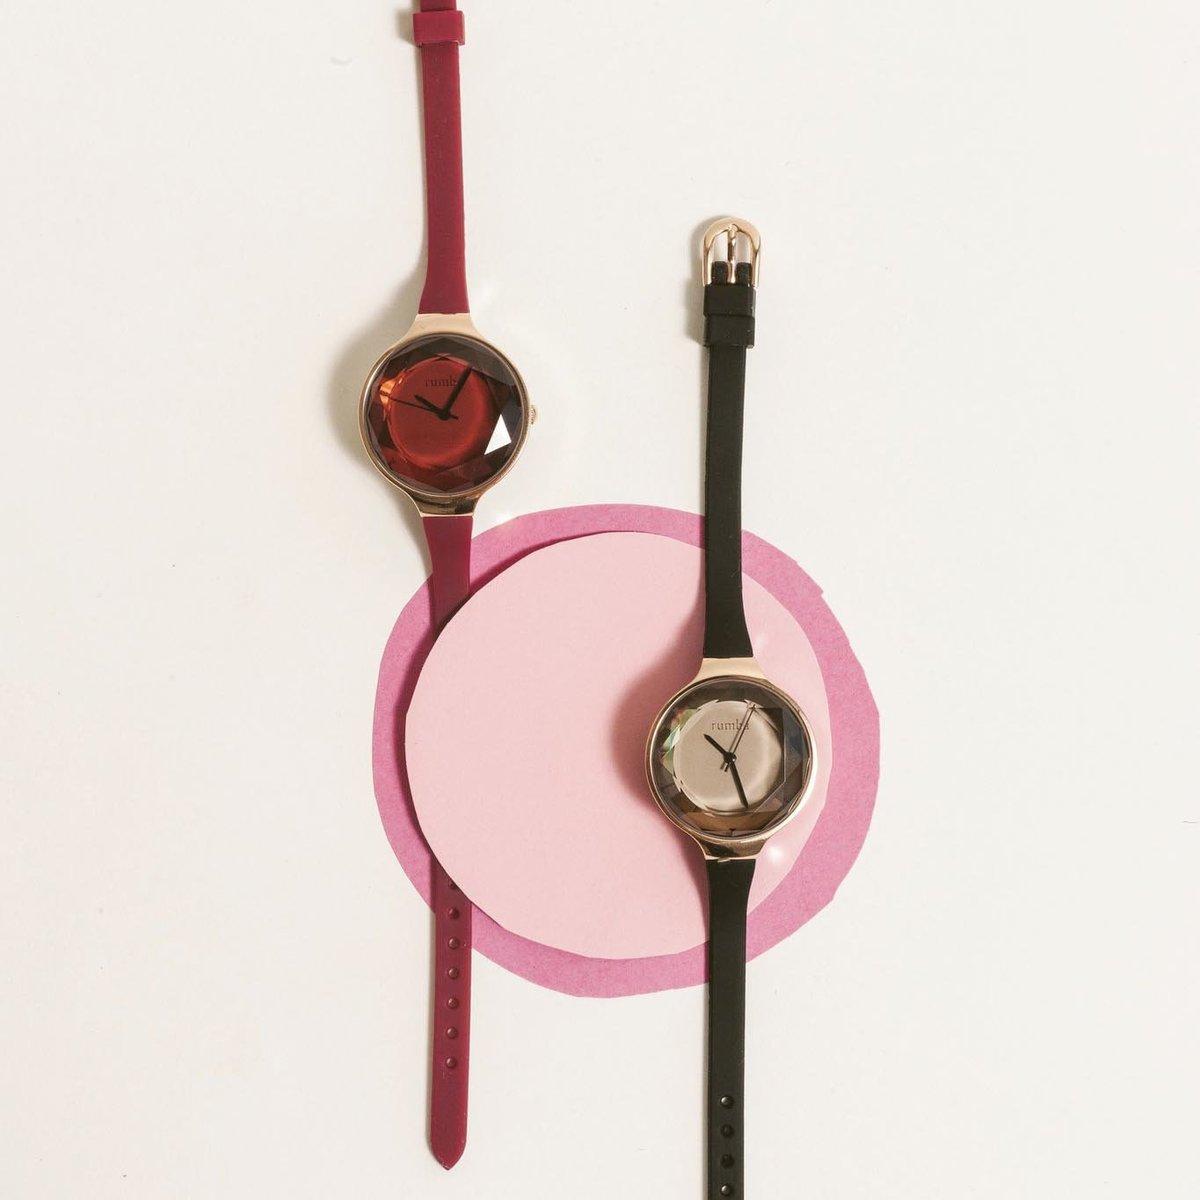 Orchard Gem Silicone Watch - Merlot